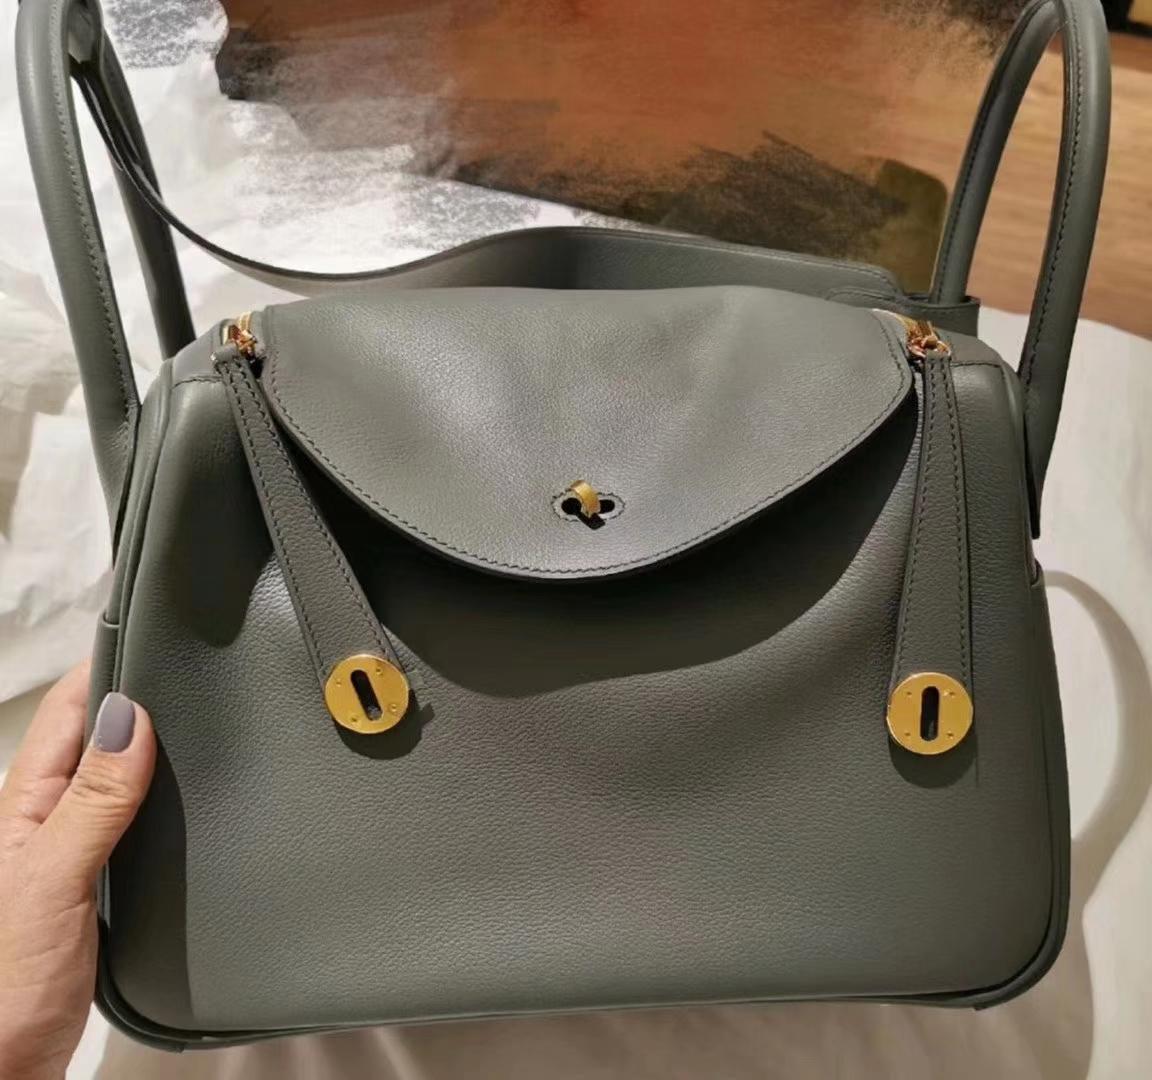 New Arrival Hermes CC63 Vert Amande Togo & Swift CalfLeather Hermes Bags Customize